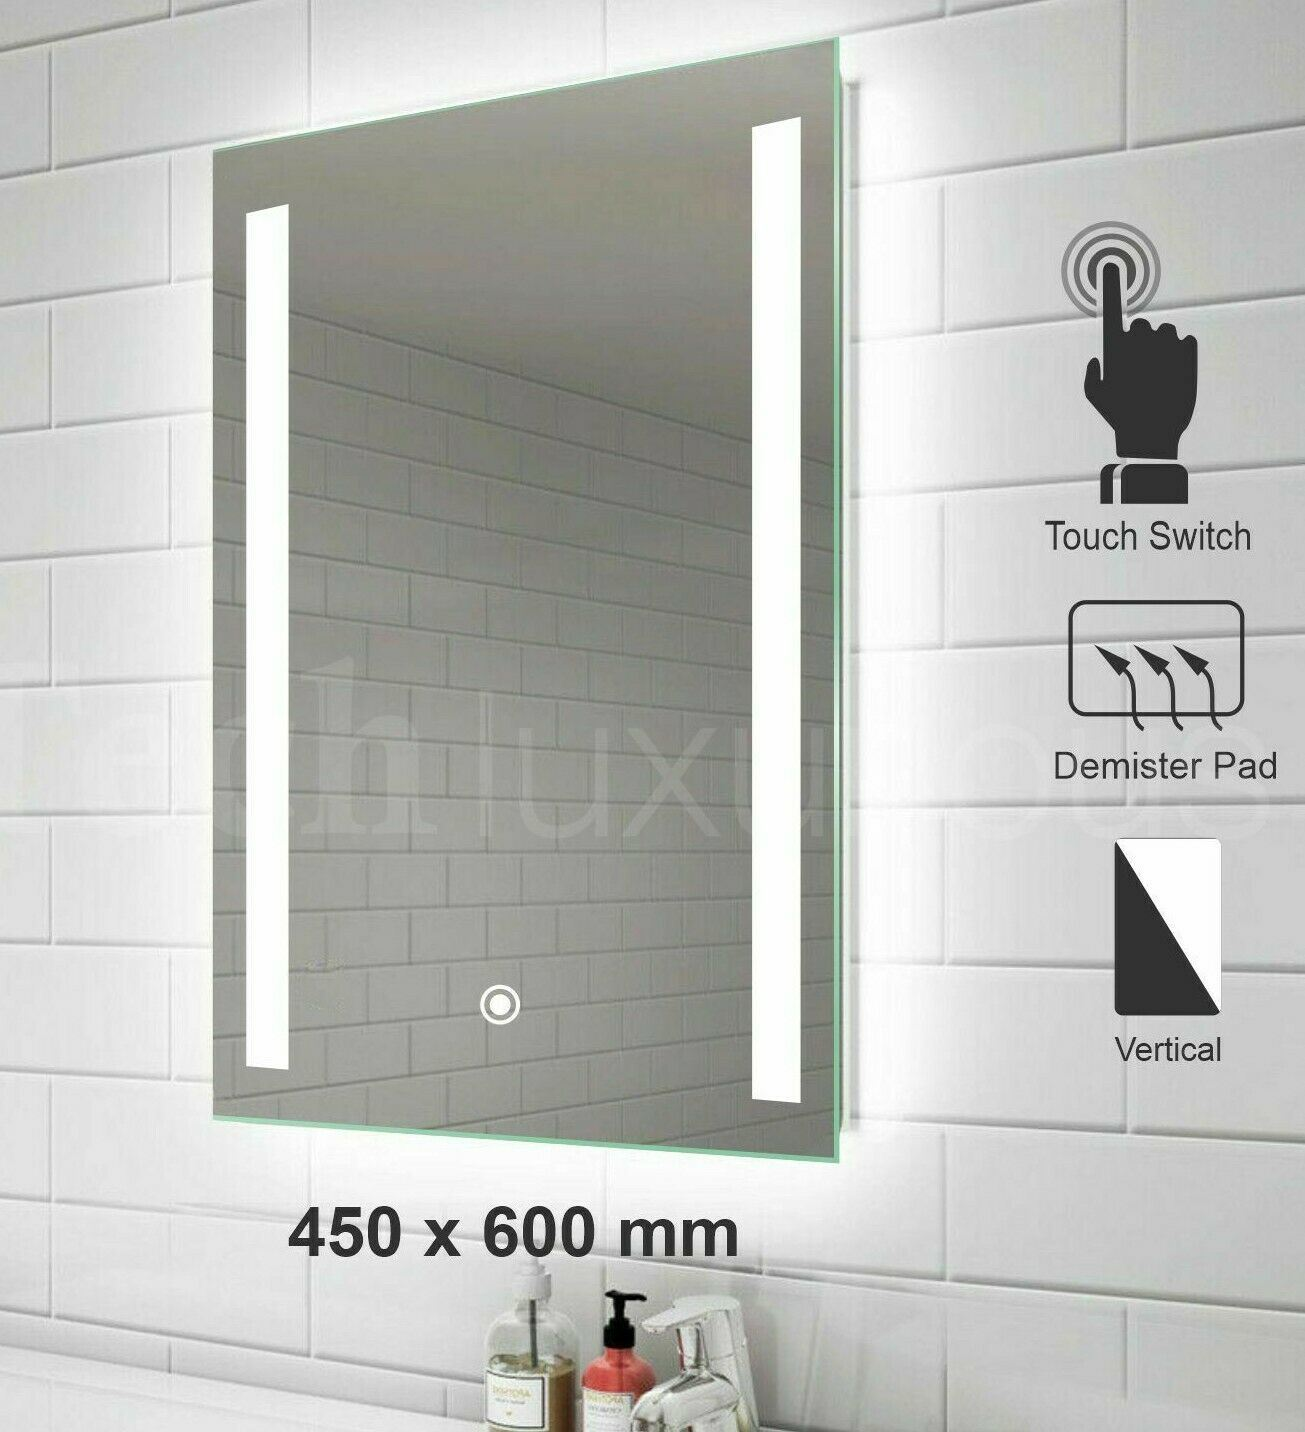 China Led Mirror Illuminated Bathroom Mirrors 450x600 Mm Light Ip44 Demister Pad Touch China Bathroom Led Mirror Led Mirror Light